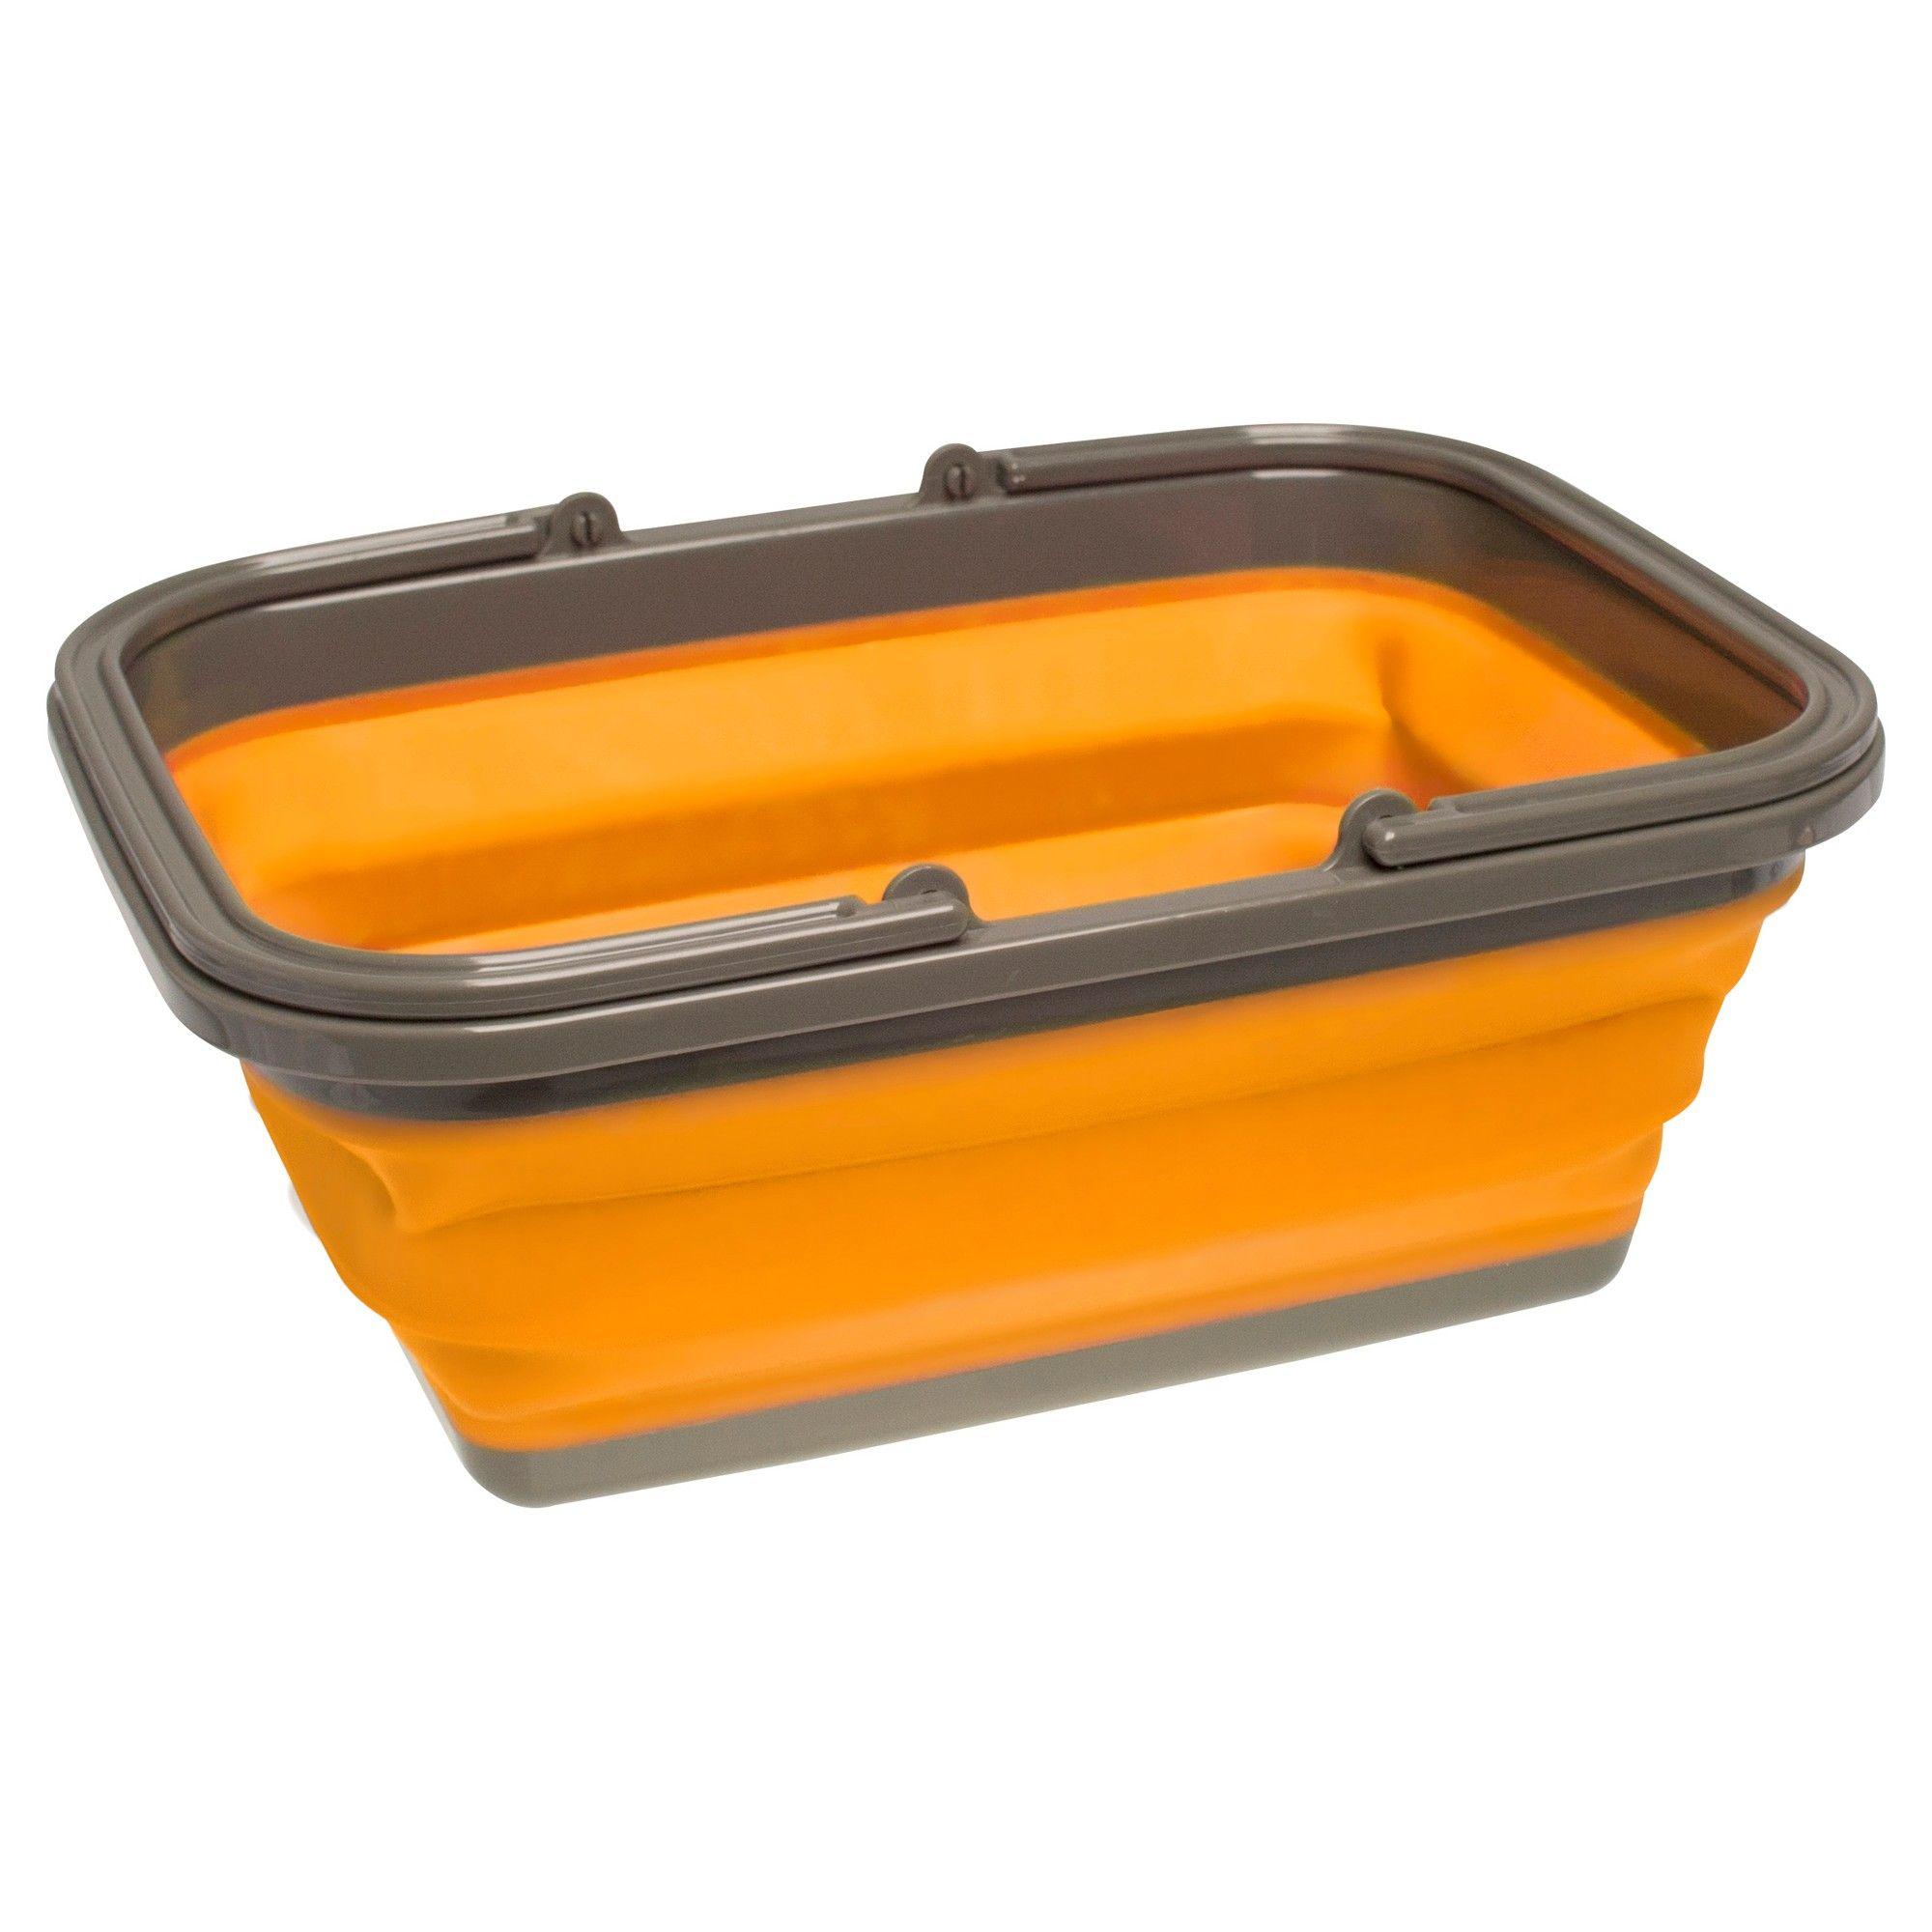 Ust Flexware Sink Orange Camping Supplies Camping Sink